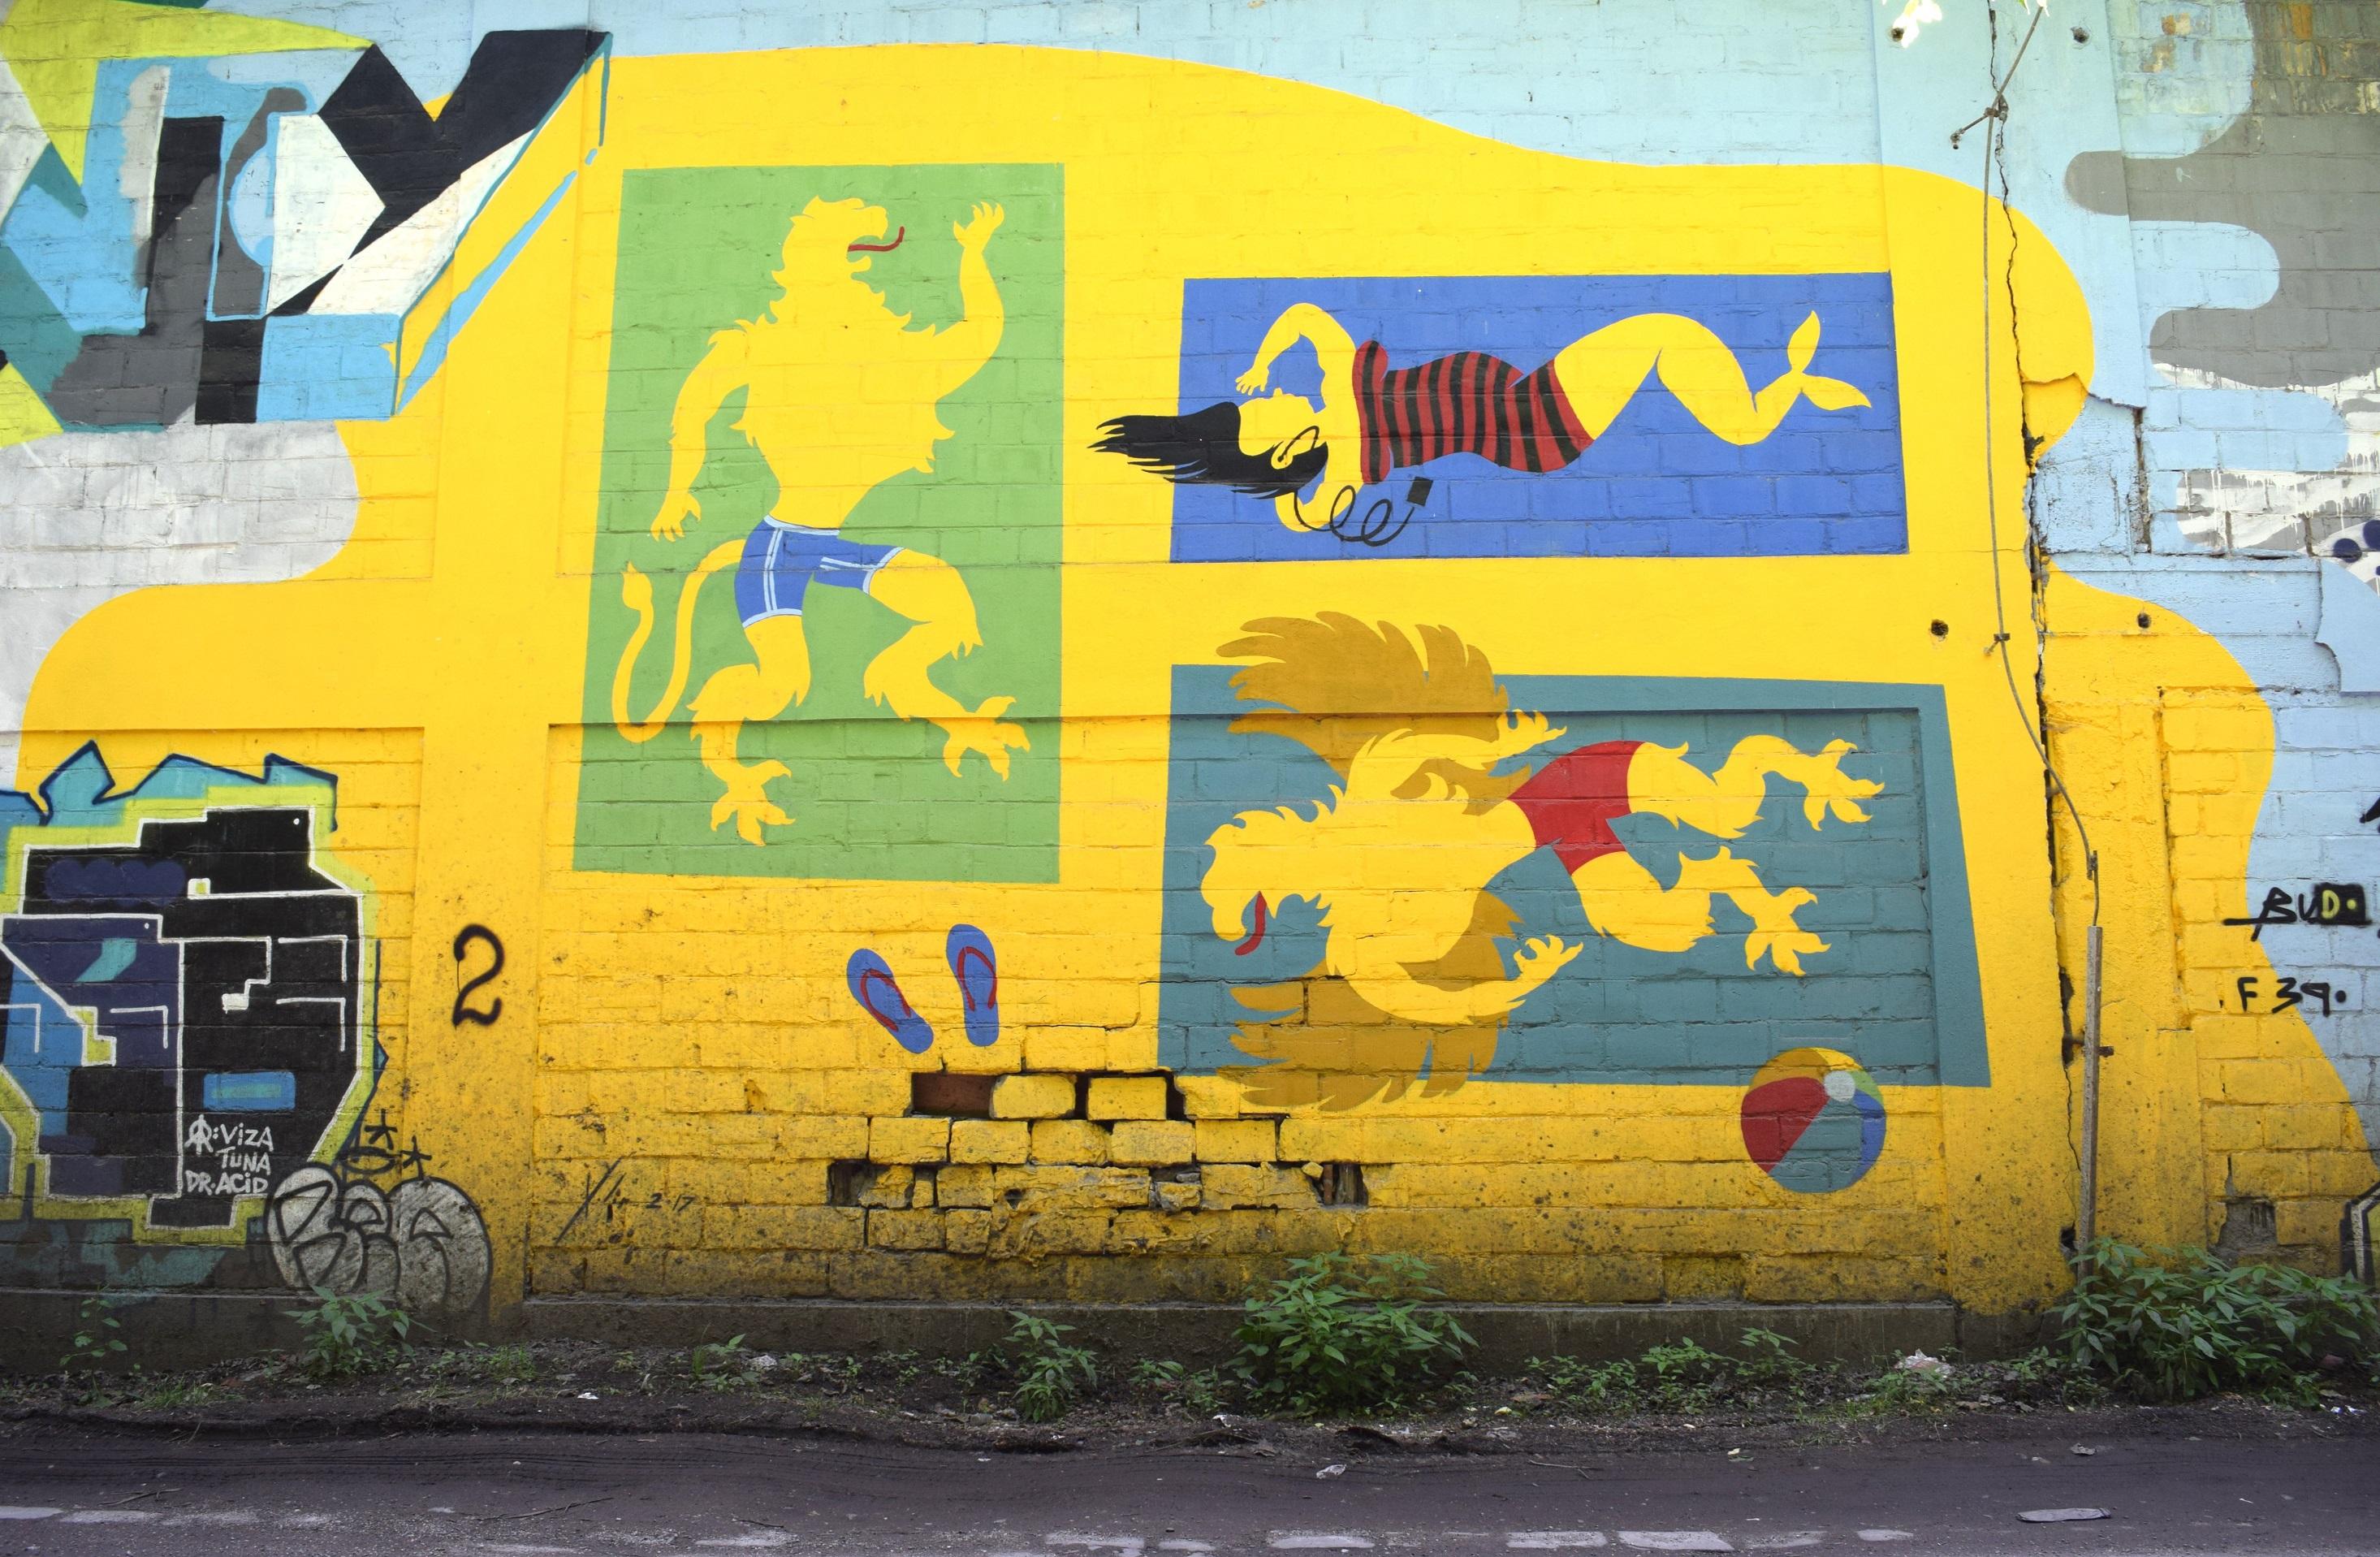 8_a_zsilip_utcai_legalis_graffiti_fal_reszlete_lengyel_intezet_foto_pleskovics_viola.JPG